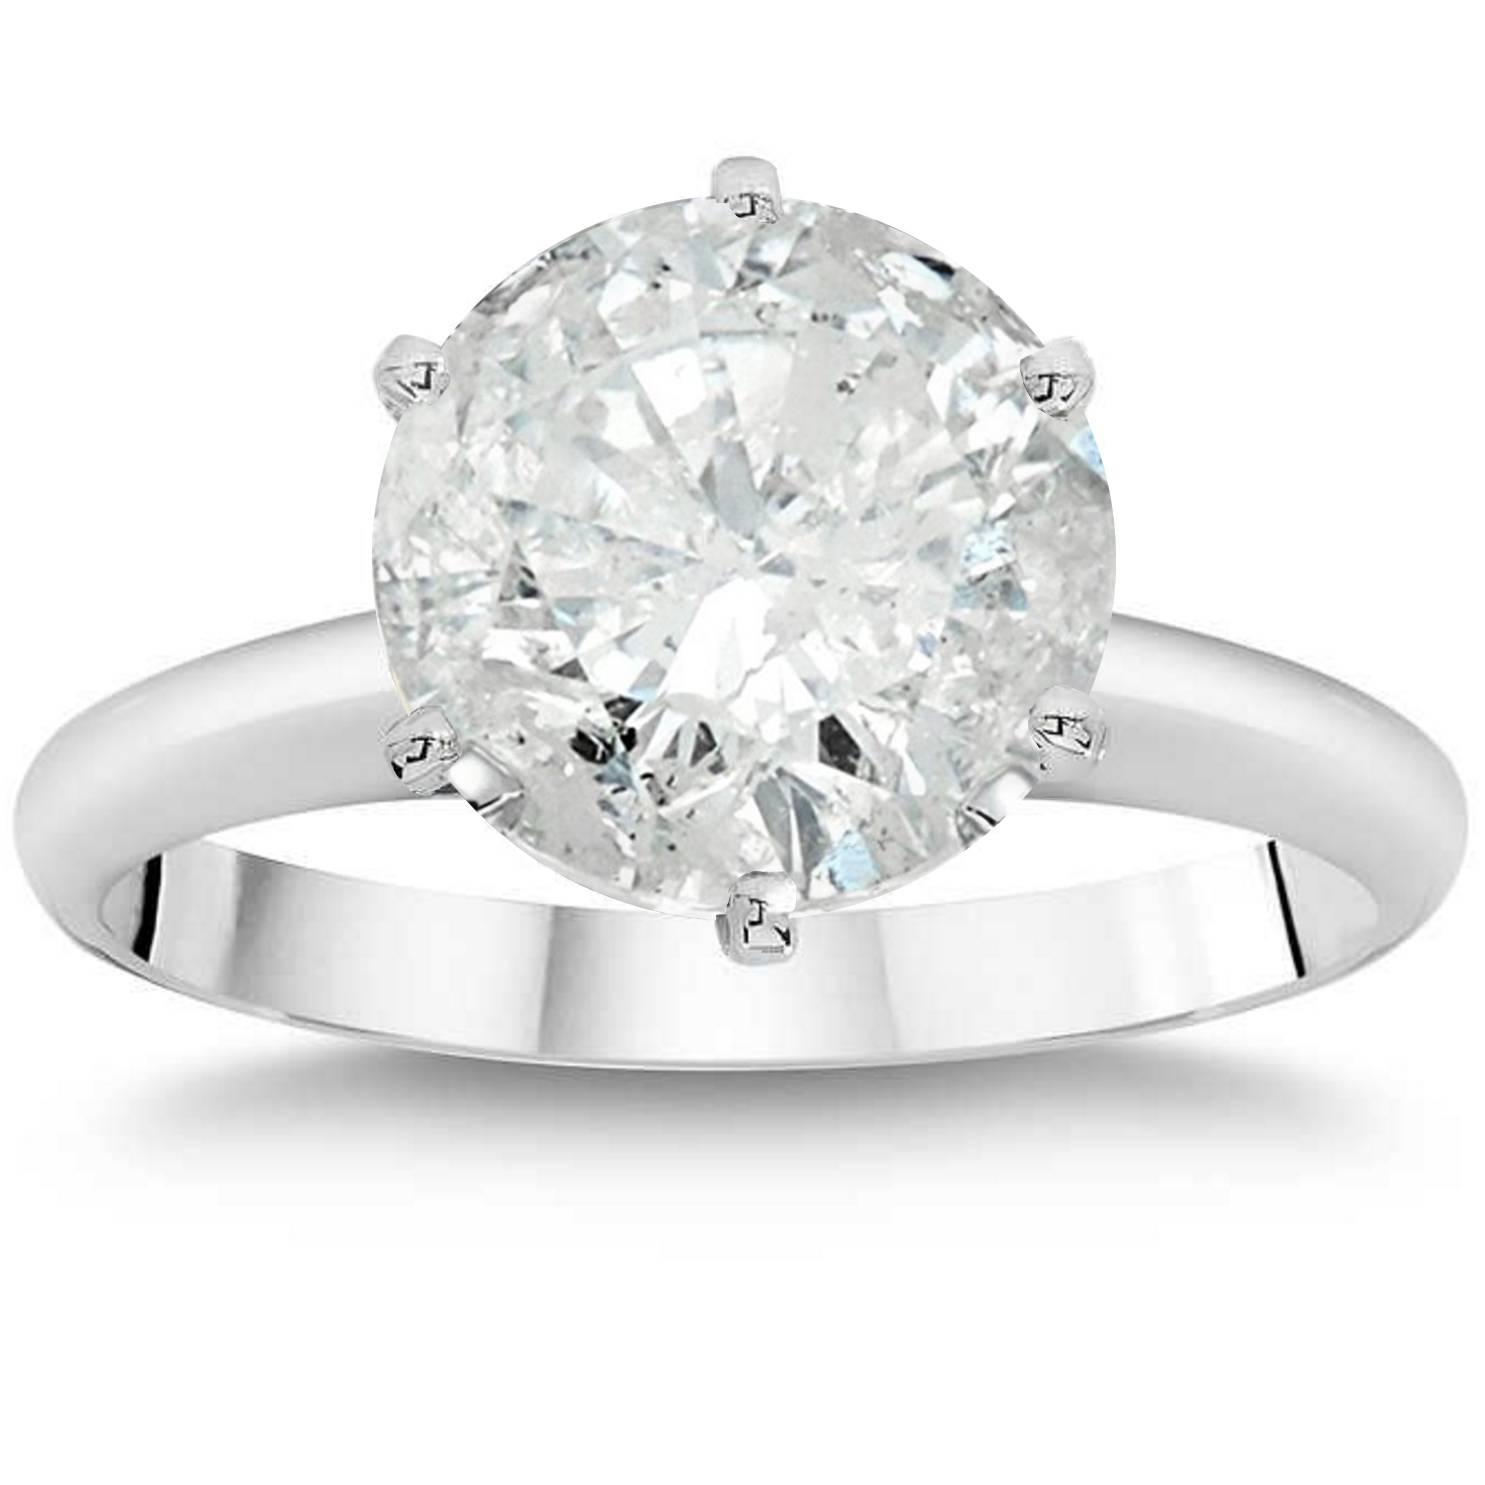 Pompeii3: 3Ct Round Brilliant Diamond Solitaire Engagement Ring 14K White  Gold Enhanced | Rakuten Within Round Brilliant Diamond Engagement Rings (View 17 of 25)